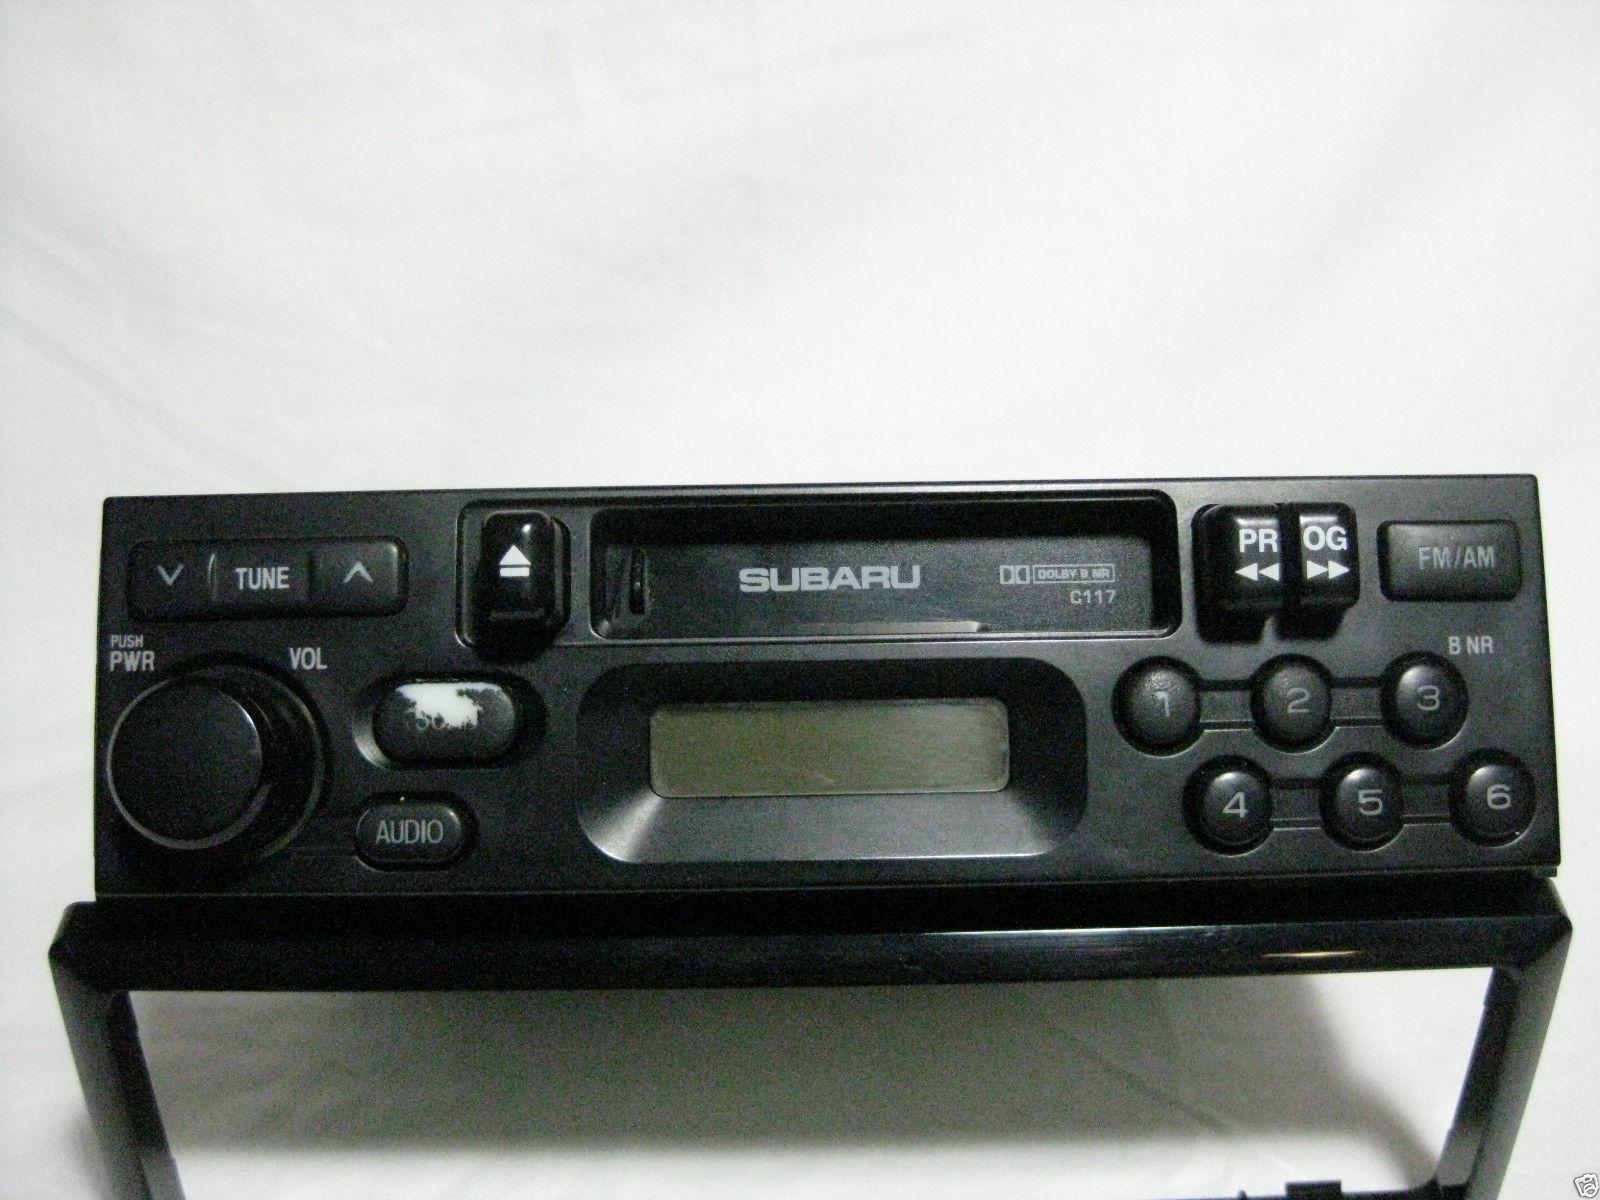 Subaru Legacy 2000 2001 Cassette player radio C117 Brighton & L models 57637g